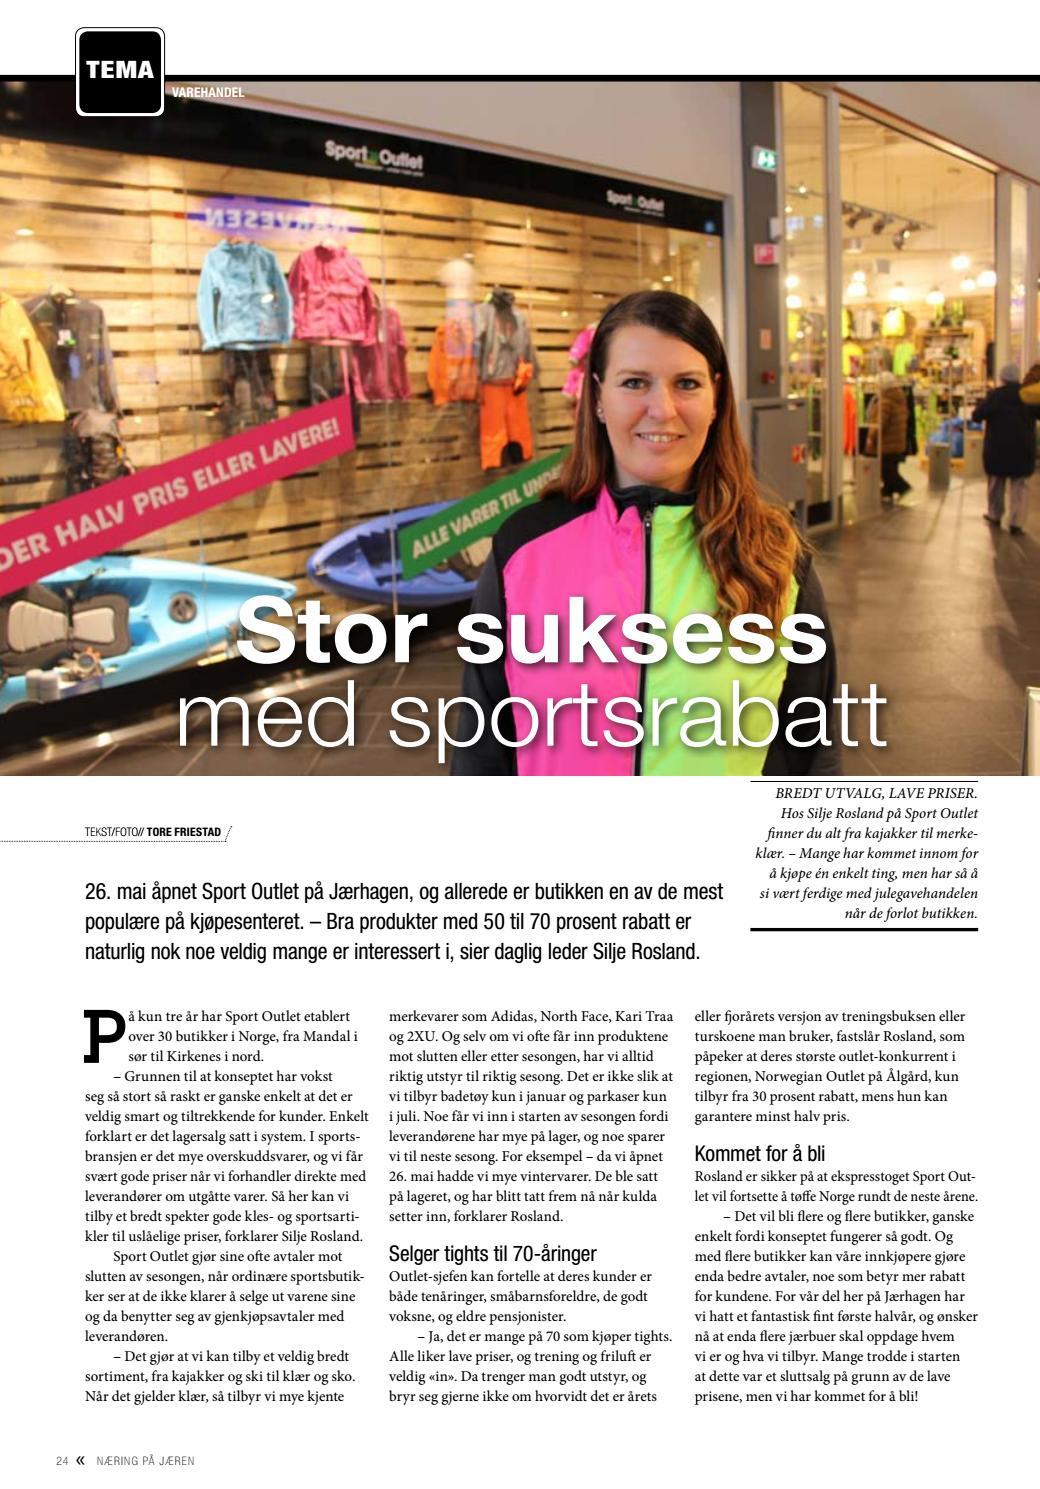 9317dbd7 Næring på Jæren 8-2016 by Lokomotiv Media - issuu